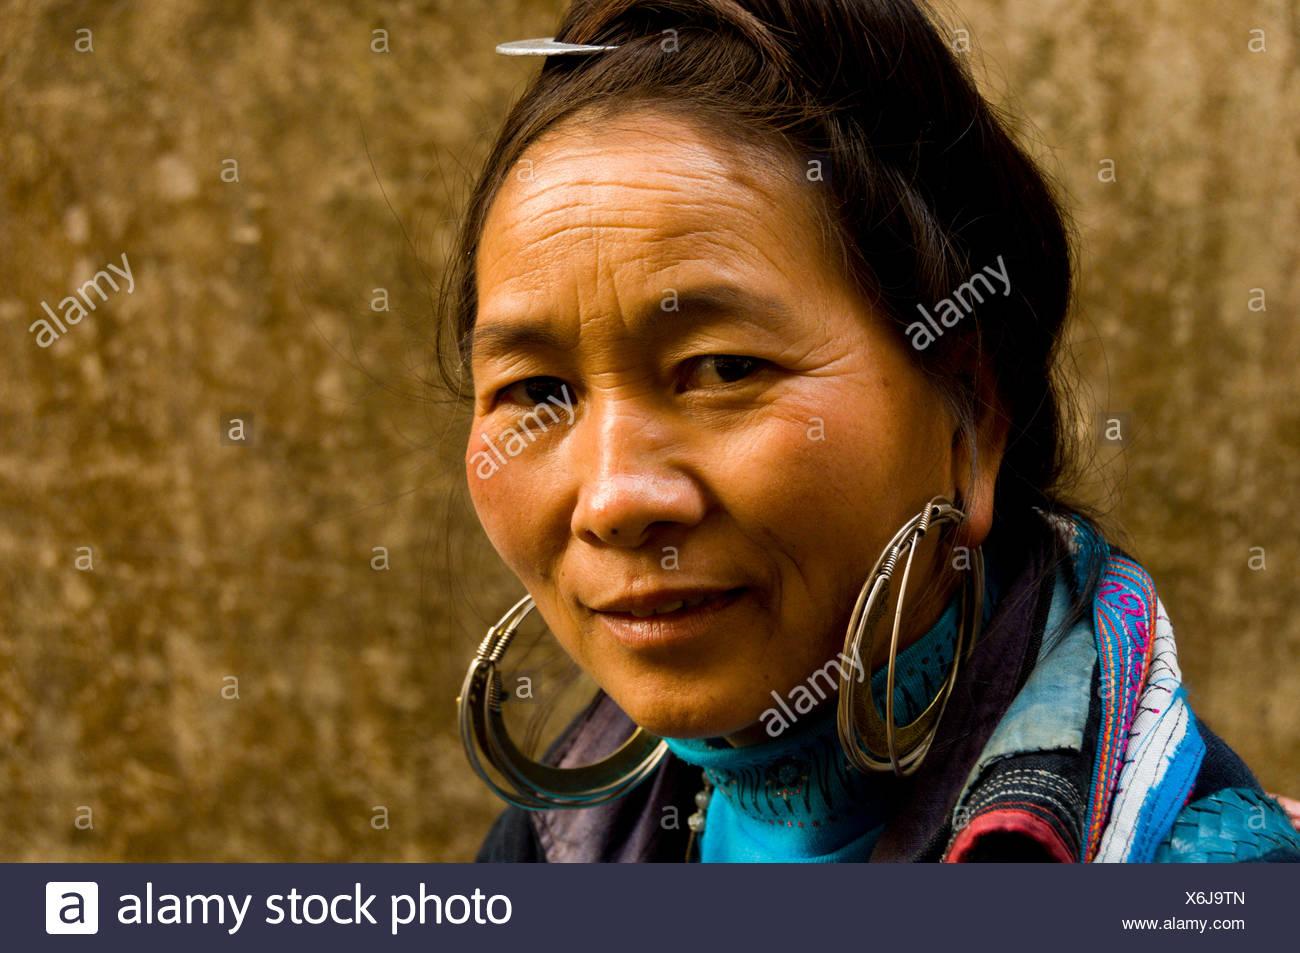 Hmong woman in Sapa, Vietnam - Stock Image